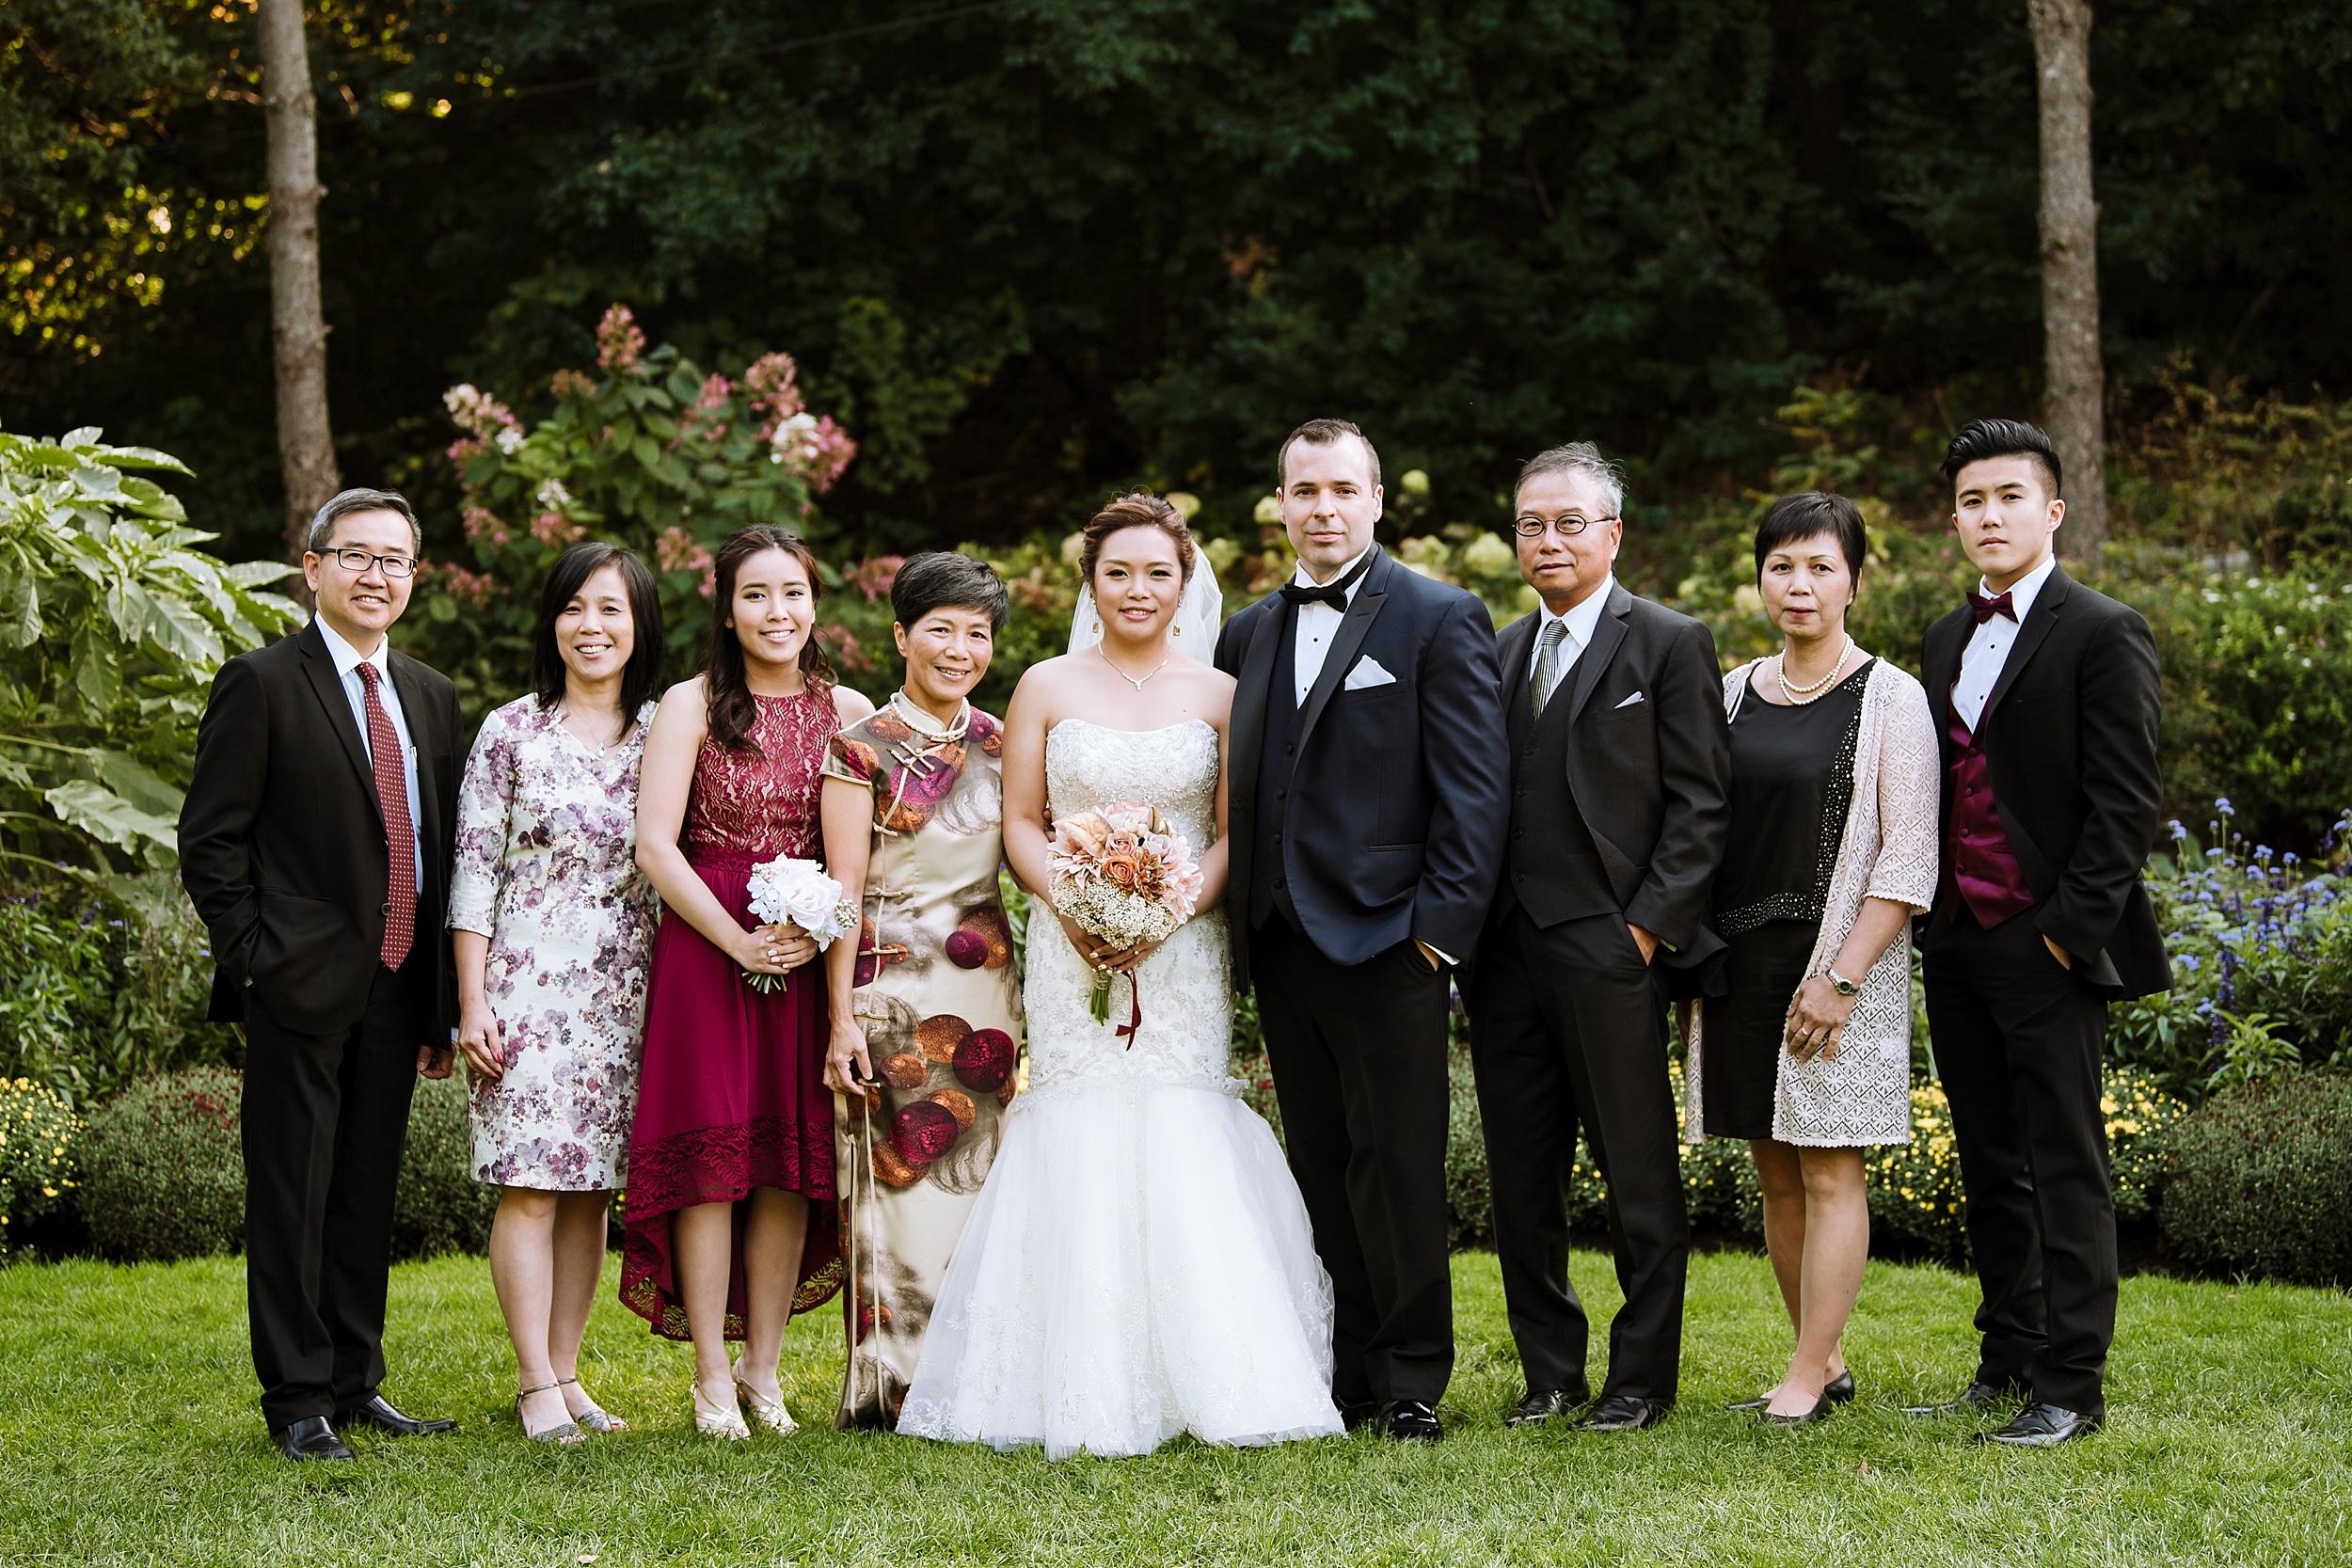 Sunnybrook_Estates_Alexander_Muir_Toronto_Wedding_Photographer_0038.jpg